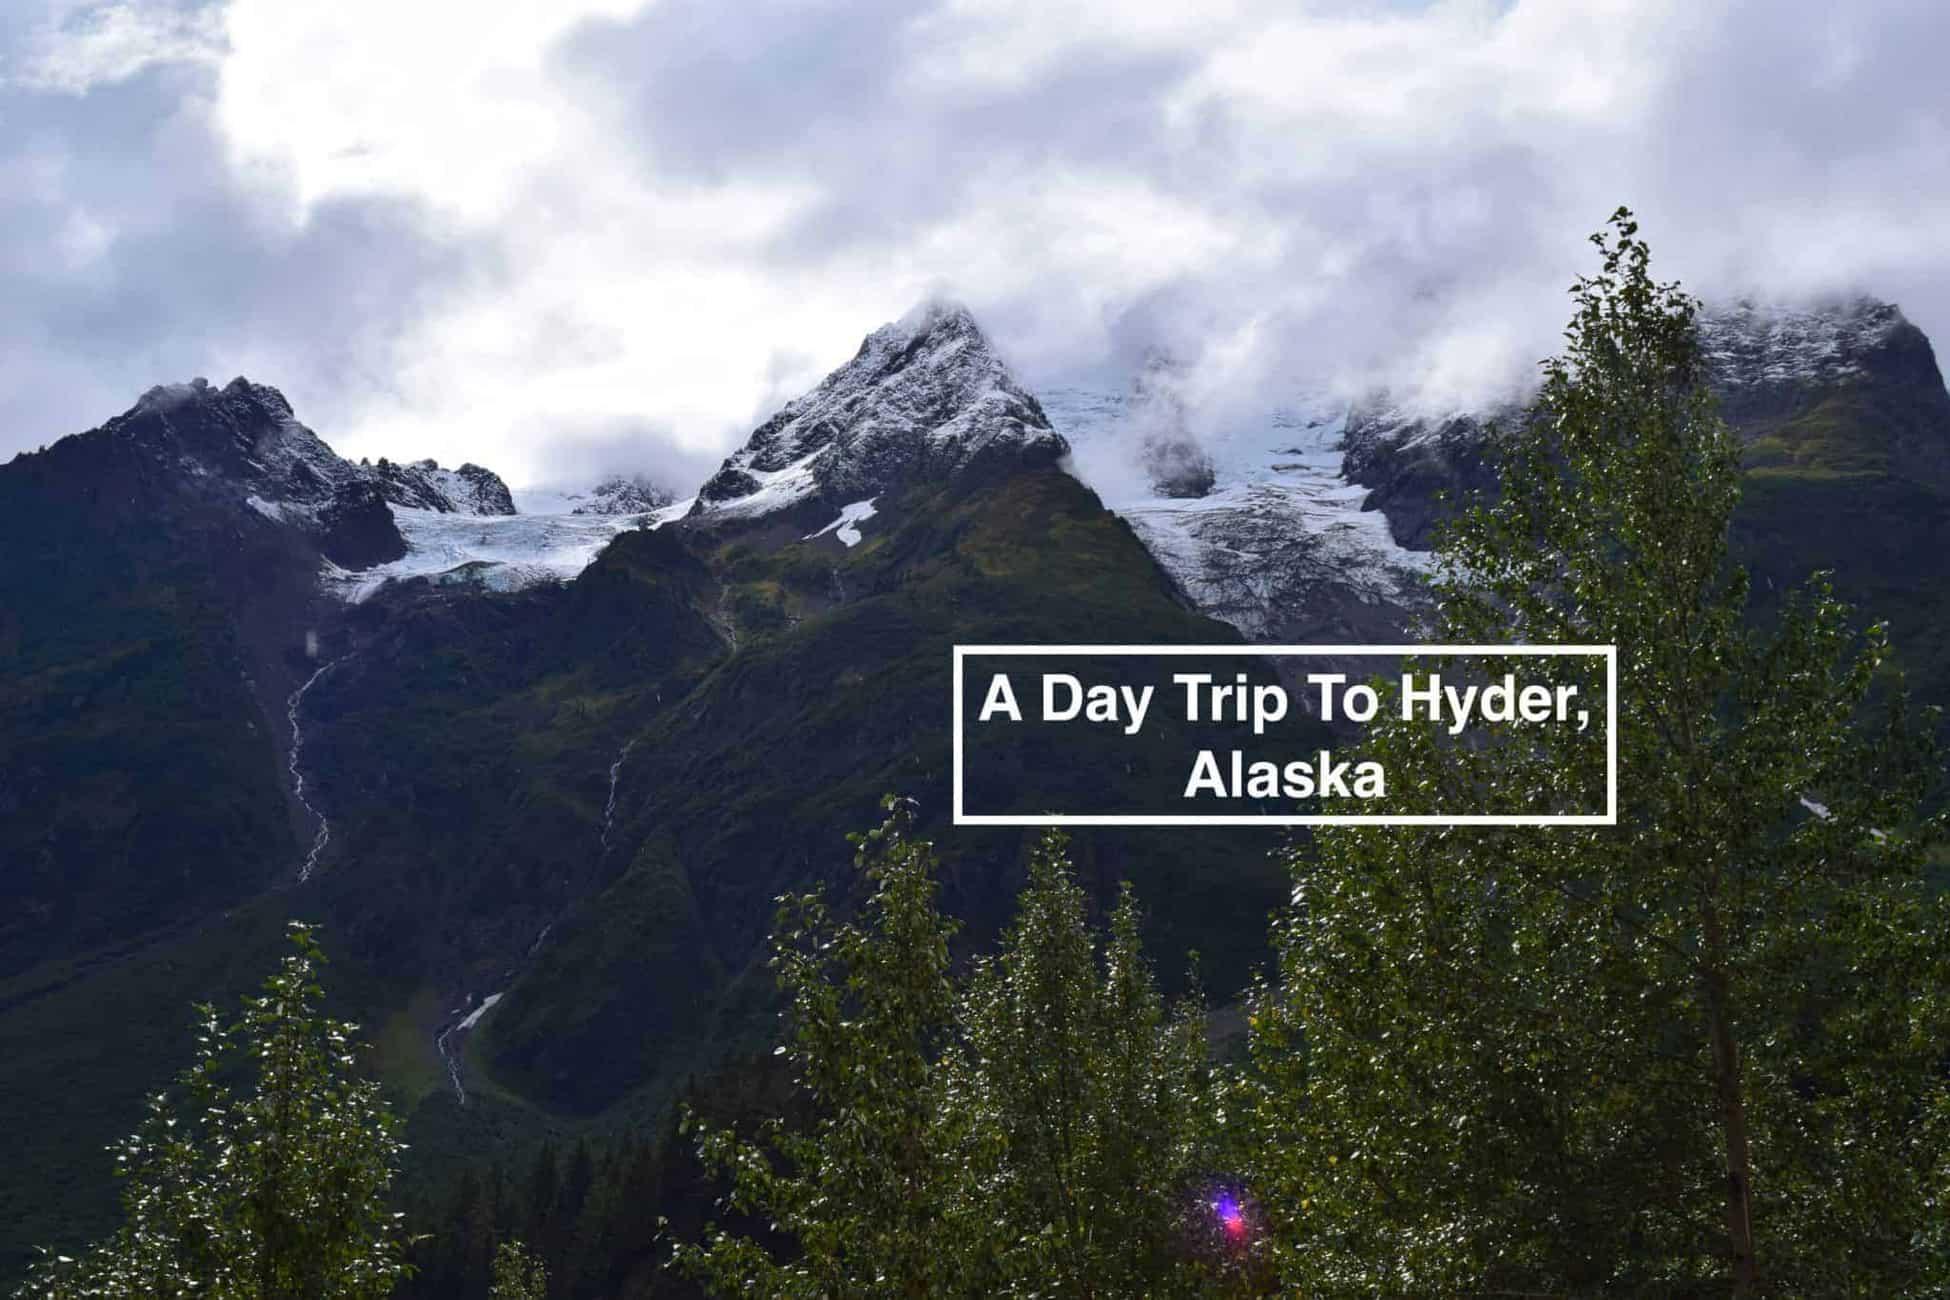 A Day Trip to Hyder Alaska